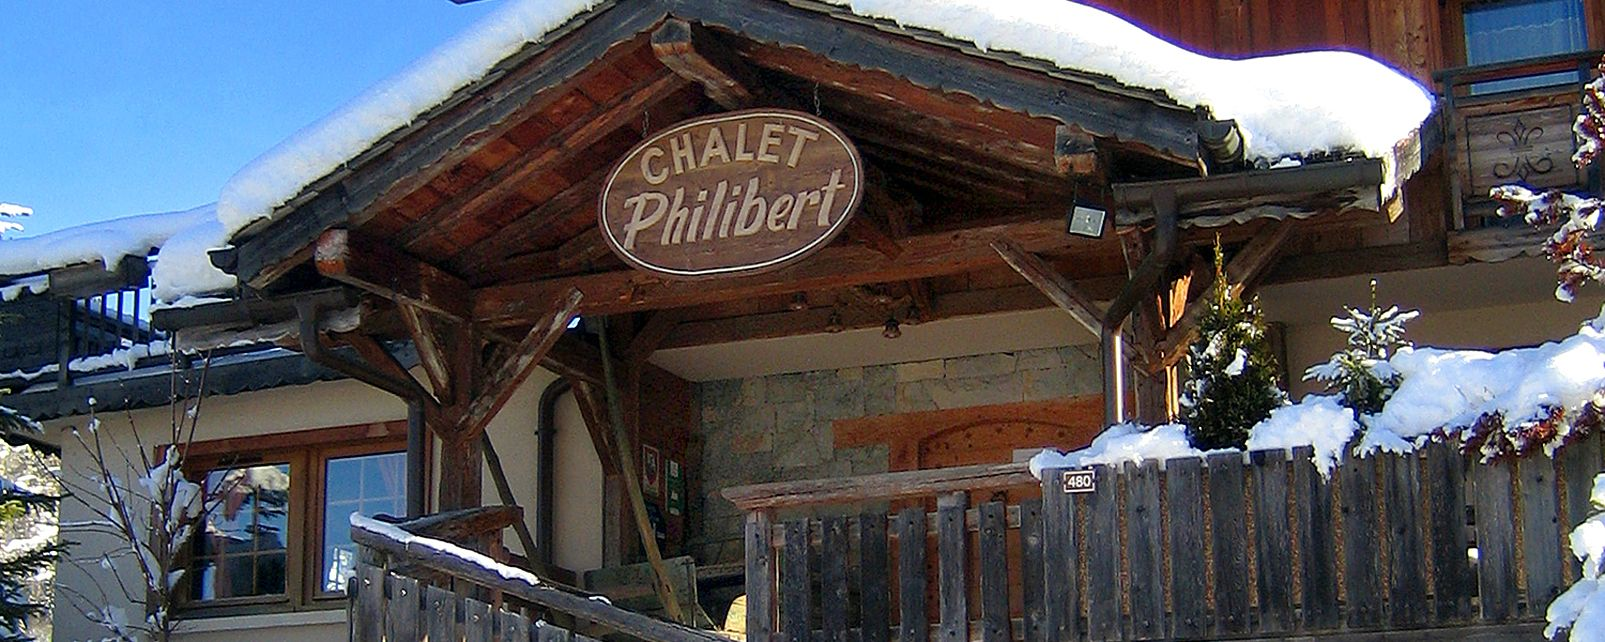 Hôtel Chalet Philibert